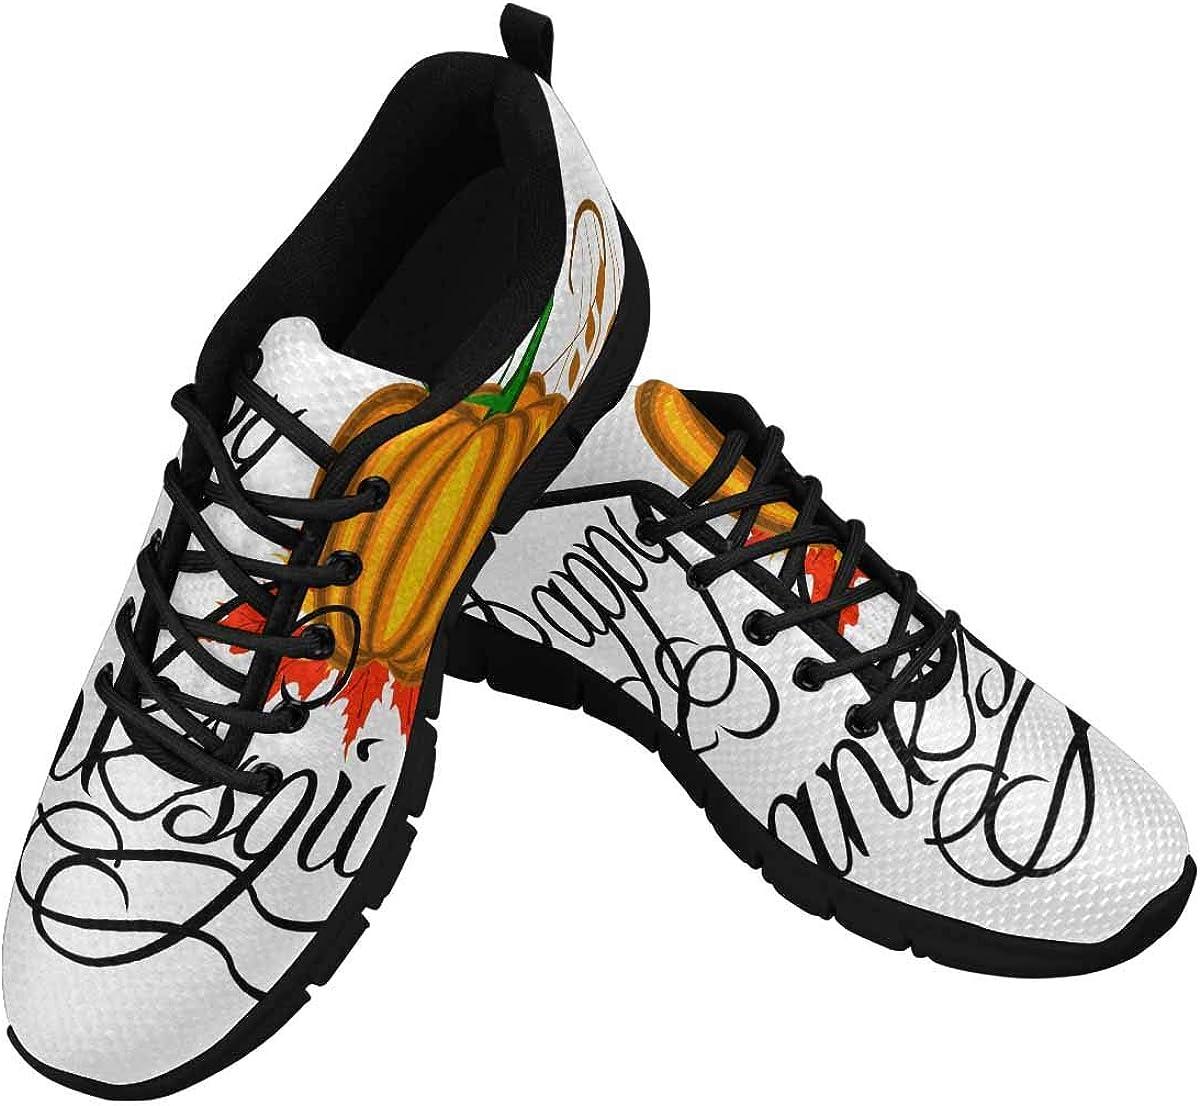 INTERESTPRINT Happy Thanksgiving Pumpkins Women's Athletic Walking Shoes Comfort Mesh Non Slip